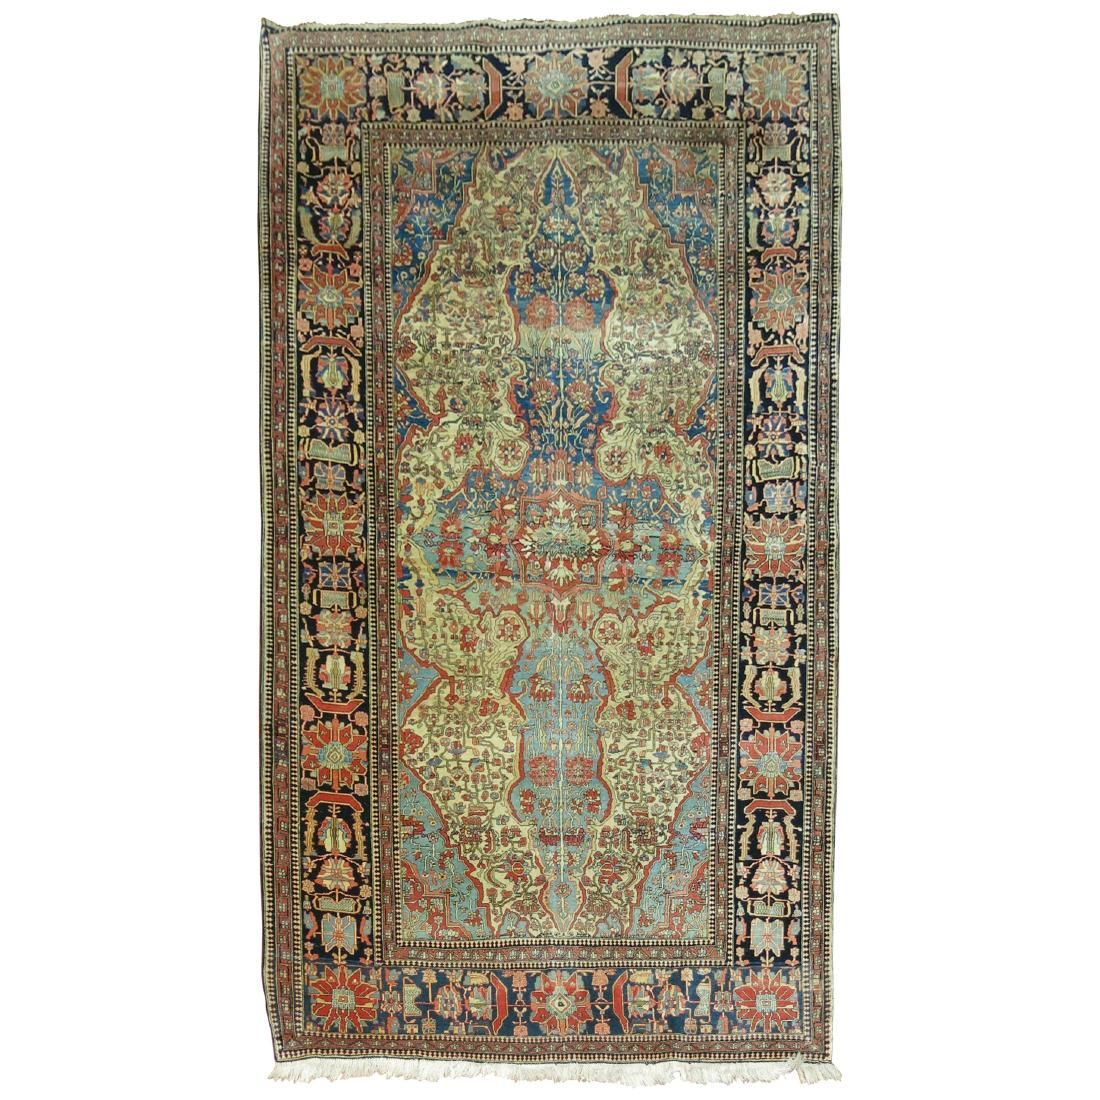 Antique Mohtasham Kashan Rug